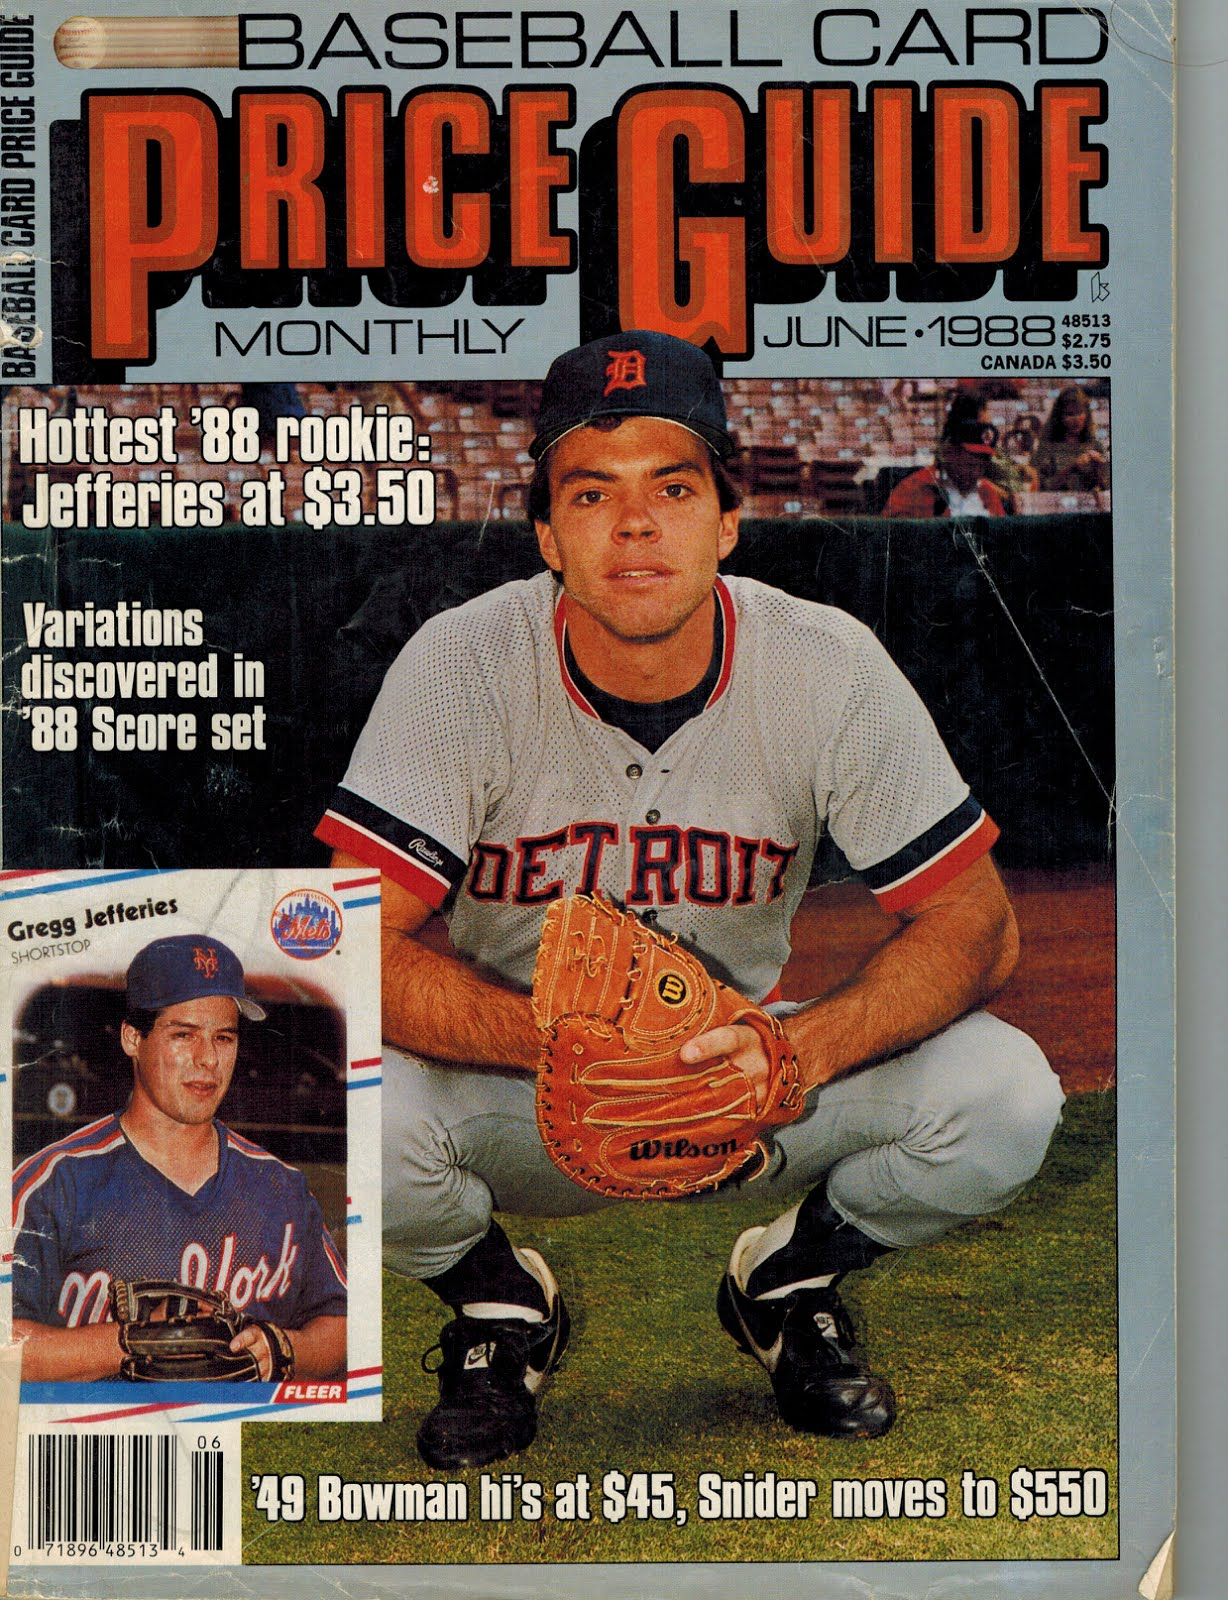 From A 1980s Baseball Card Collector June 1988 Baseball